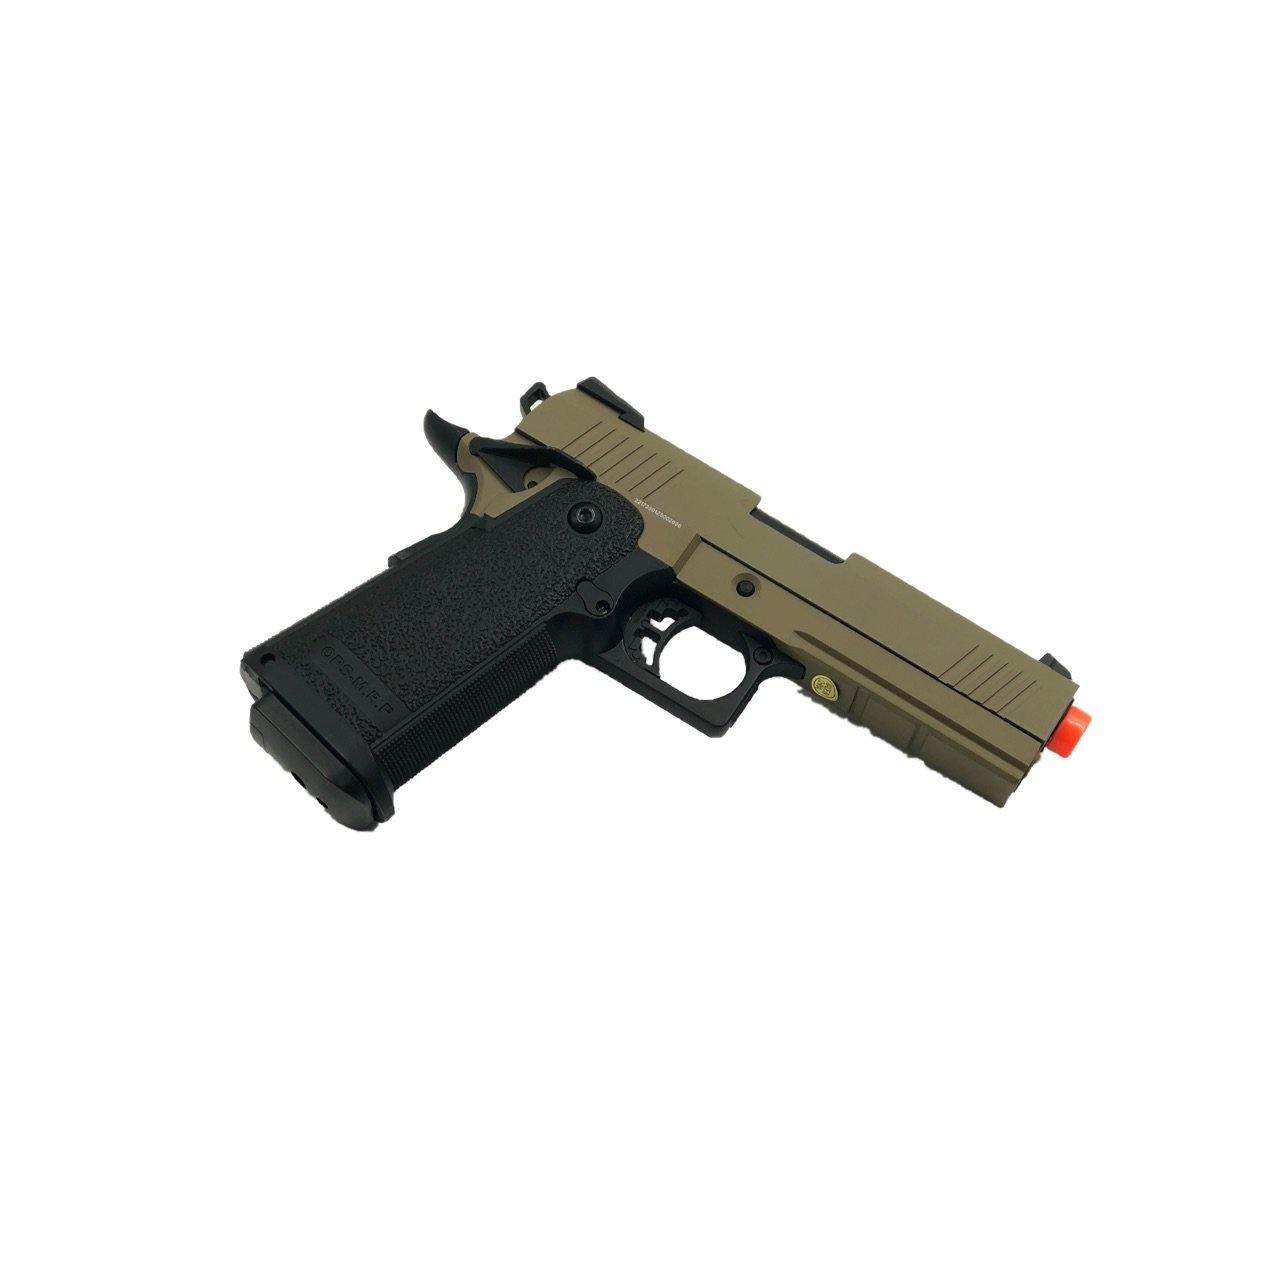 Jag Arms JAG Arms GM4 4.3 GBB Pistol